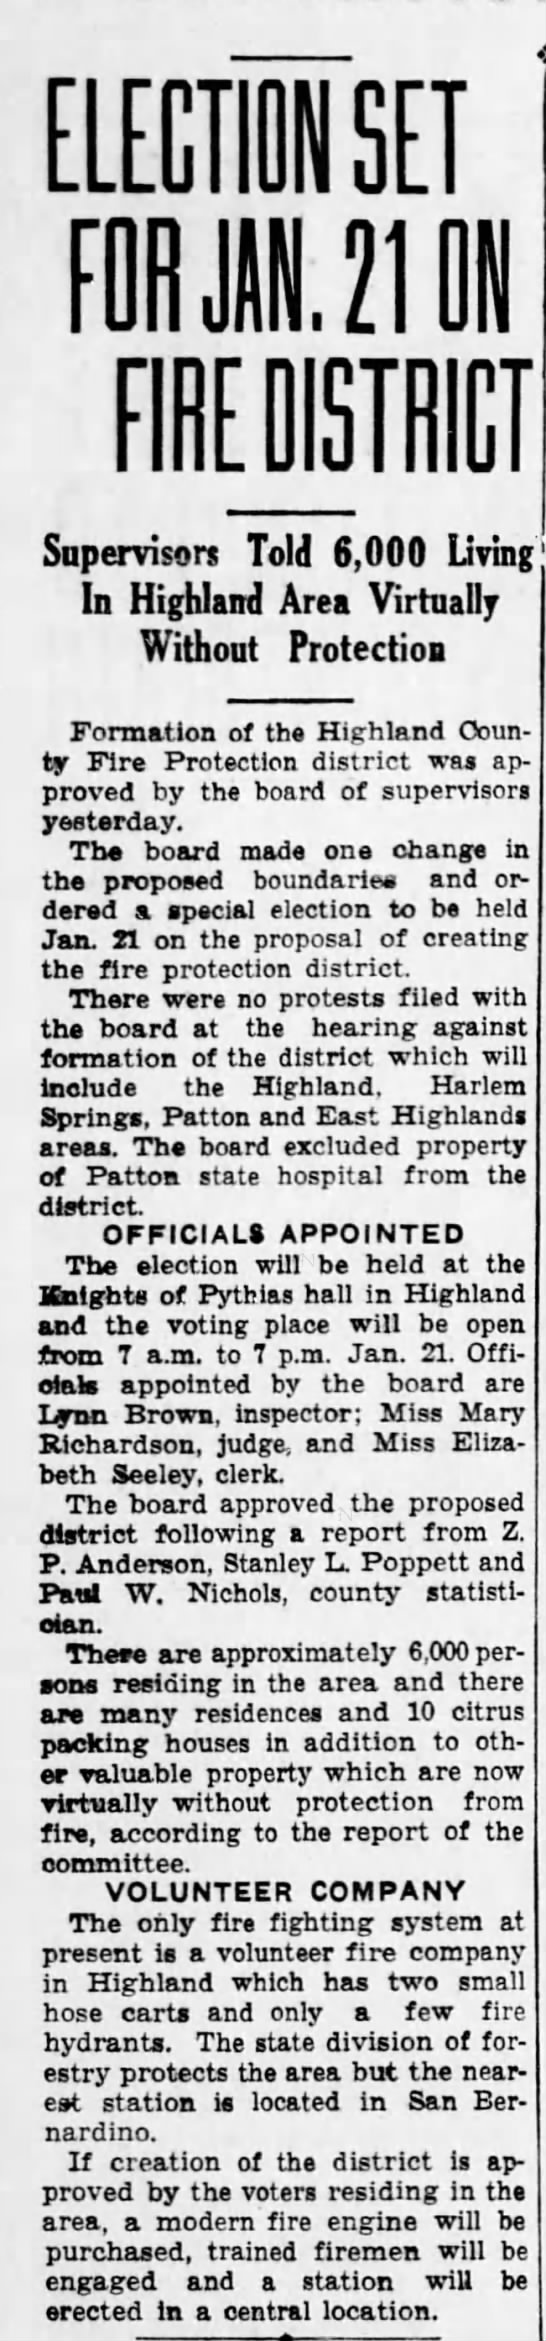 1937-12-28 Election Set For Jan. 21 on Highland Fire District